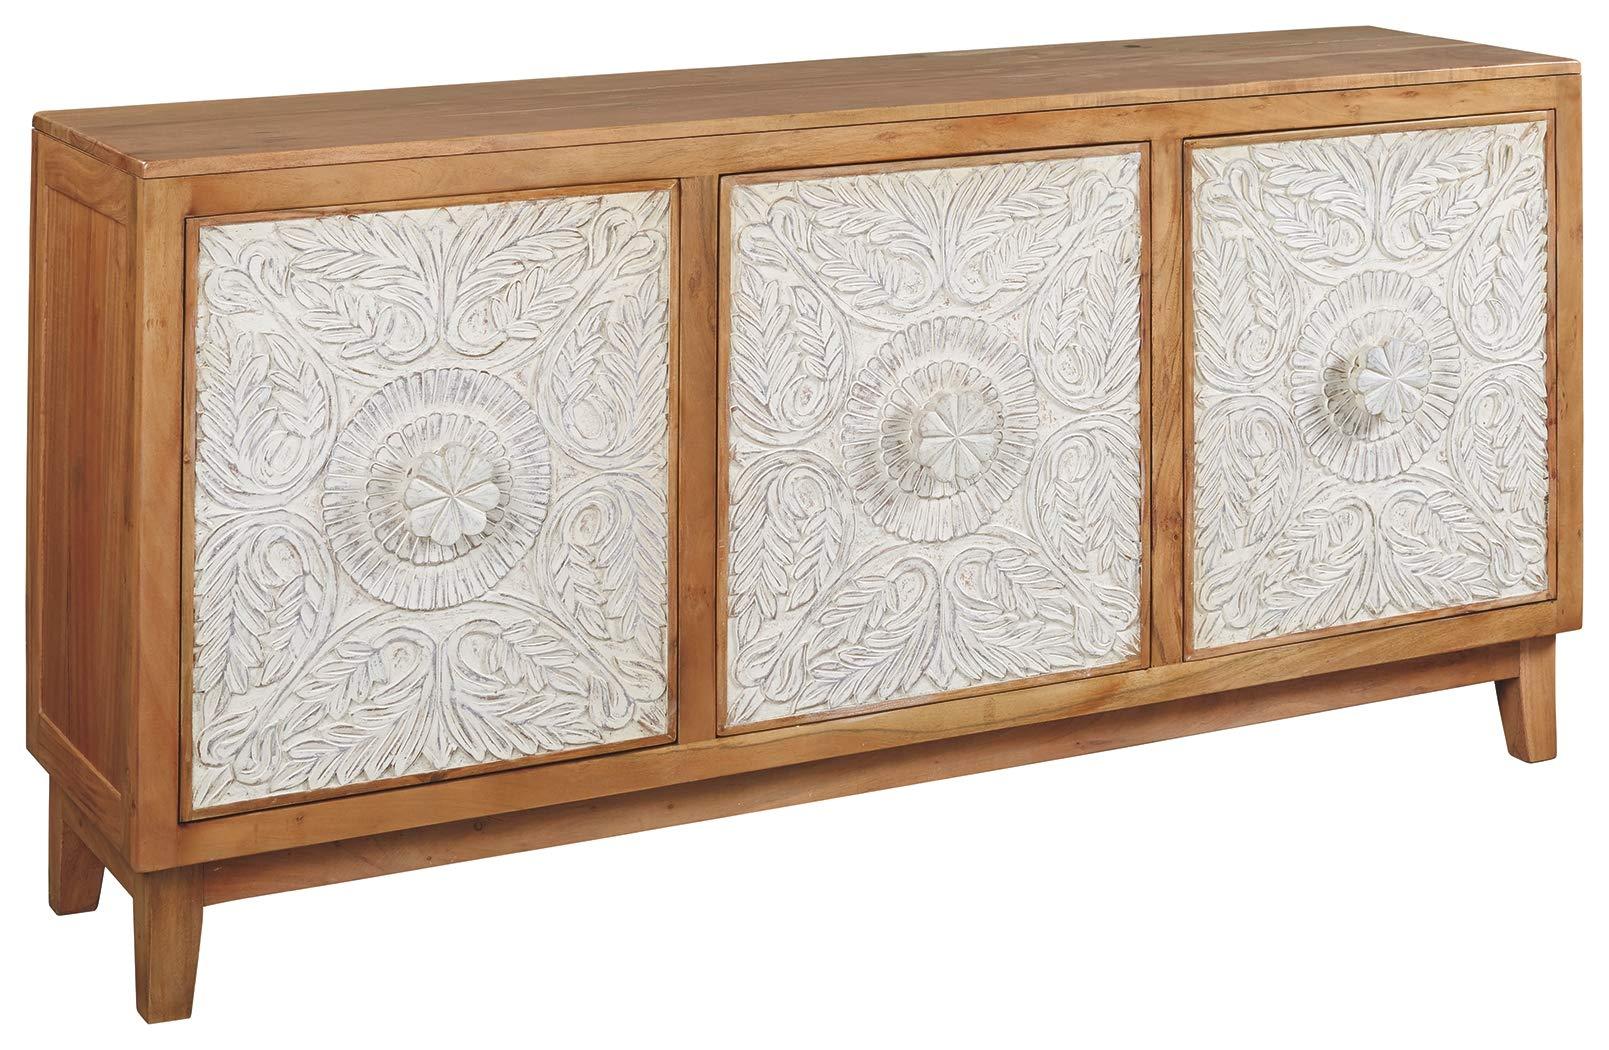 Ashley Furniture Signature Design - Lorenburg Accent Cabinet - Boho Chic - Antique White/Brown by Signature Design by Ashley